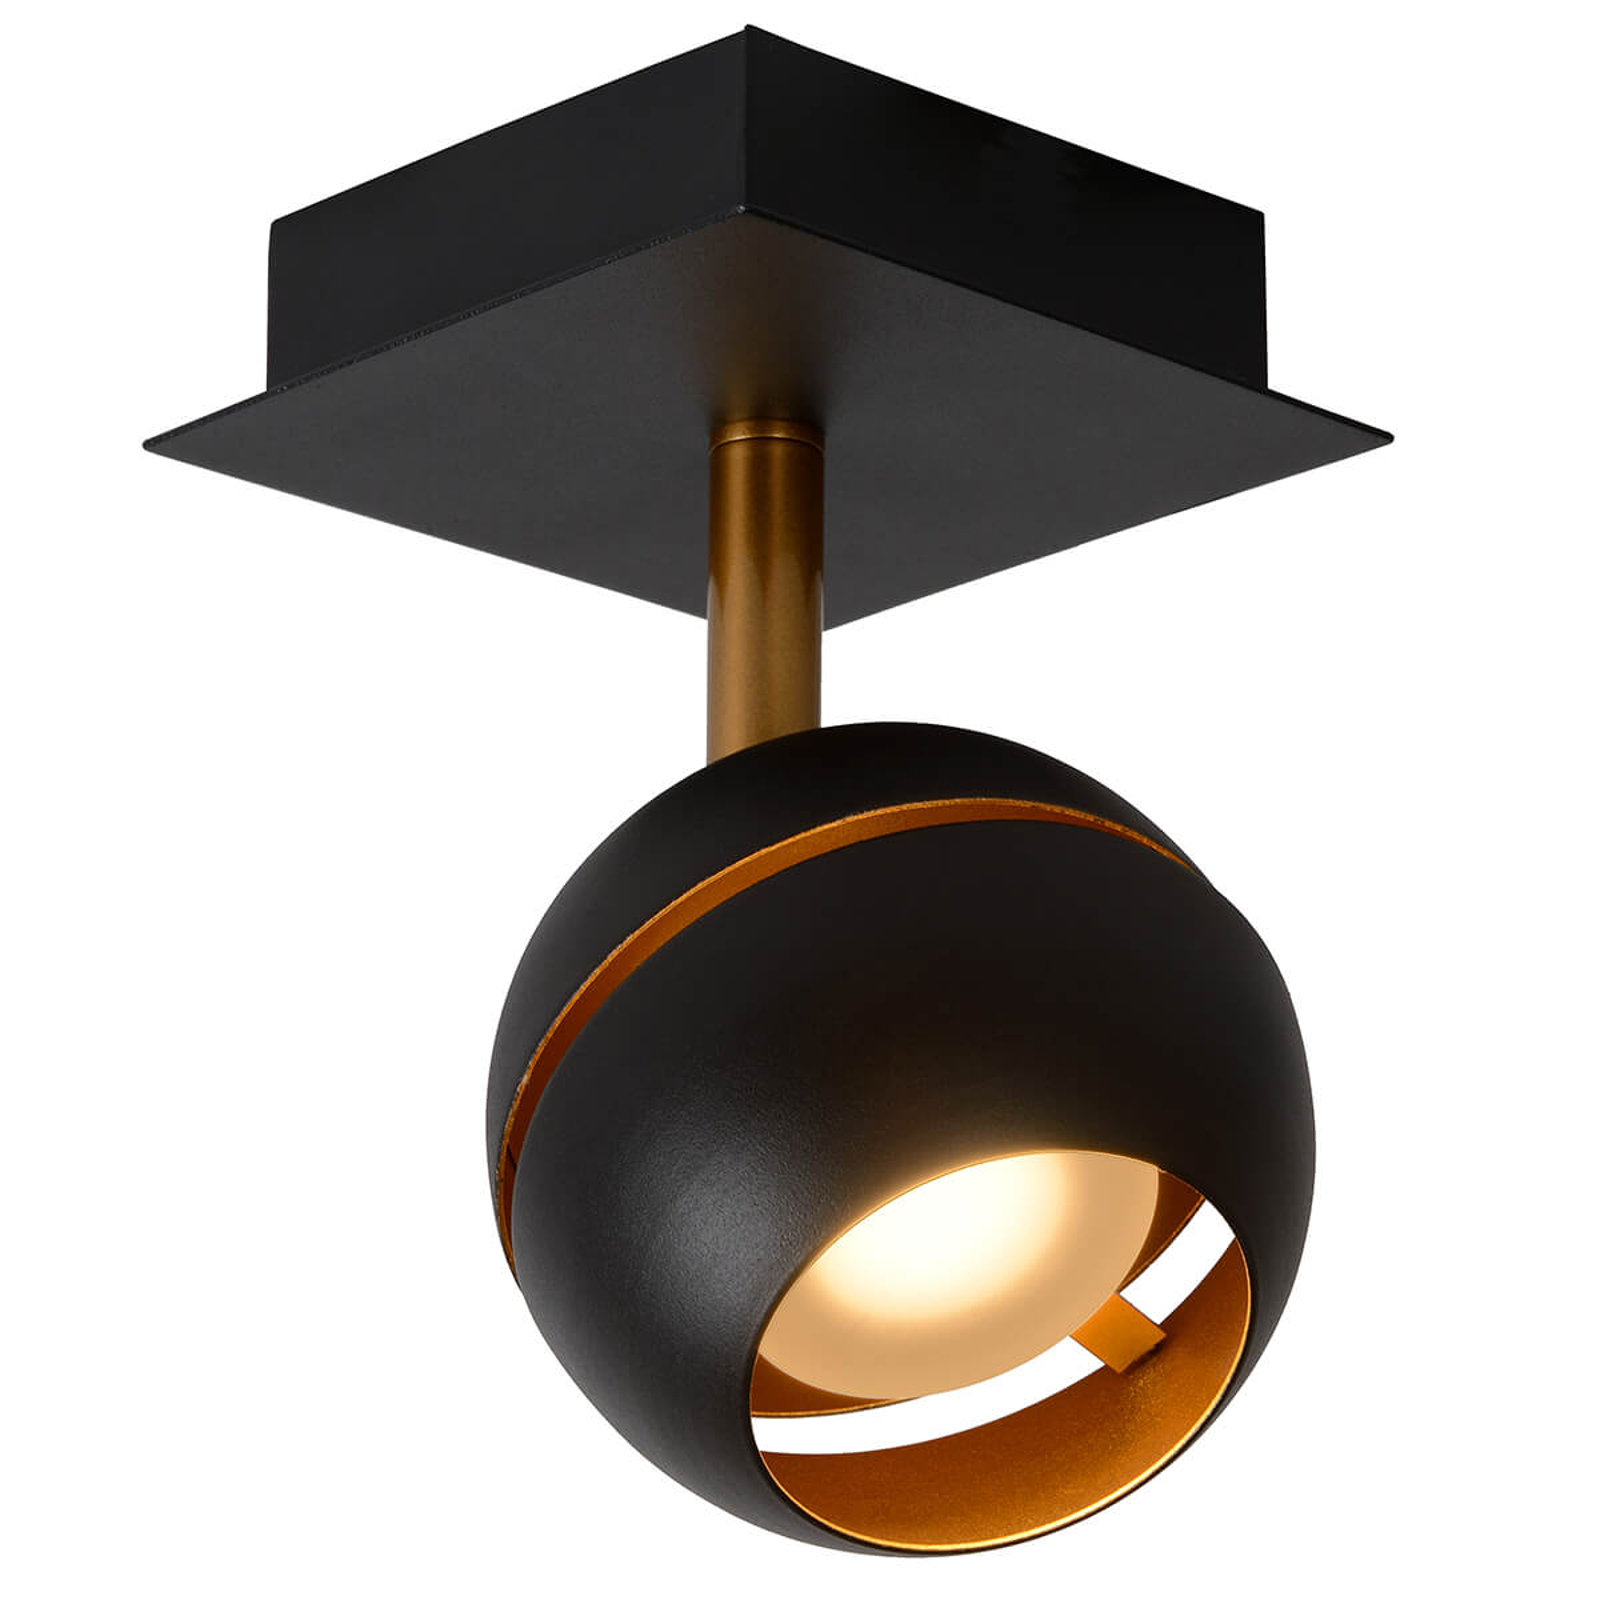 LED-Deckenstrahler Binari in Kugelform, schwarz